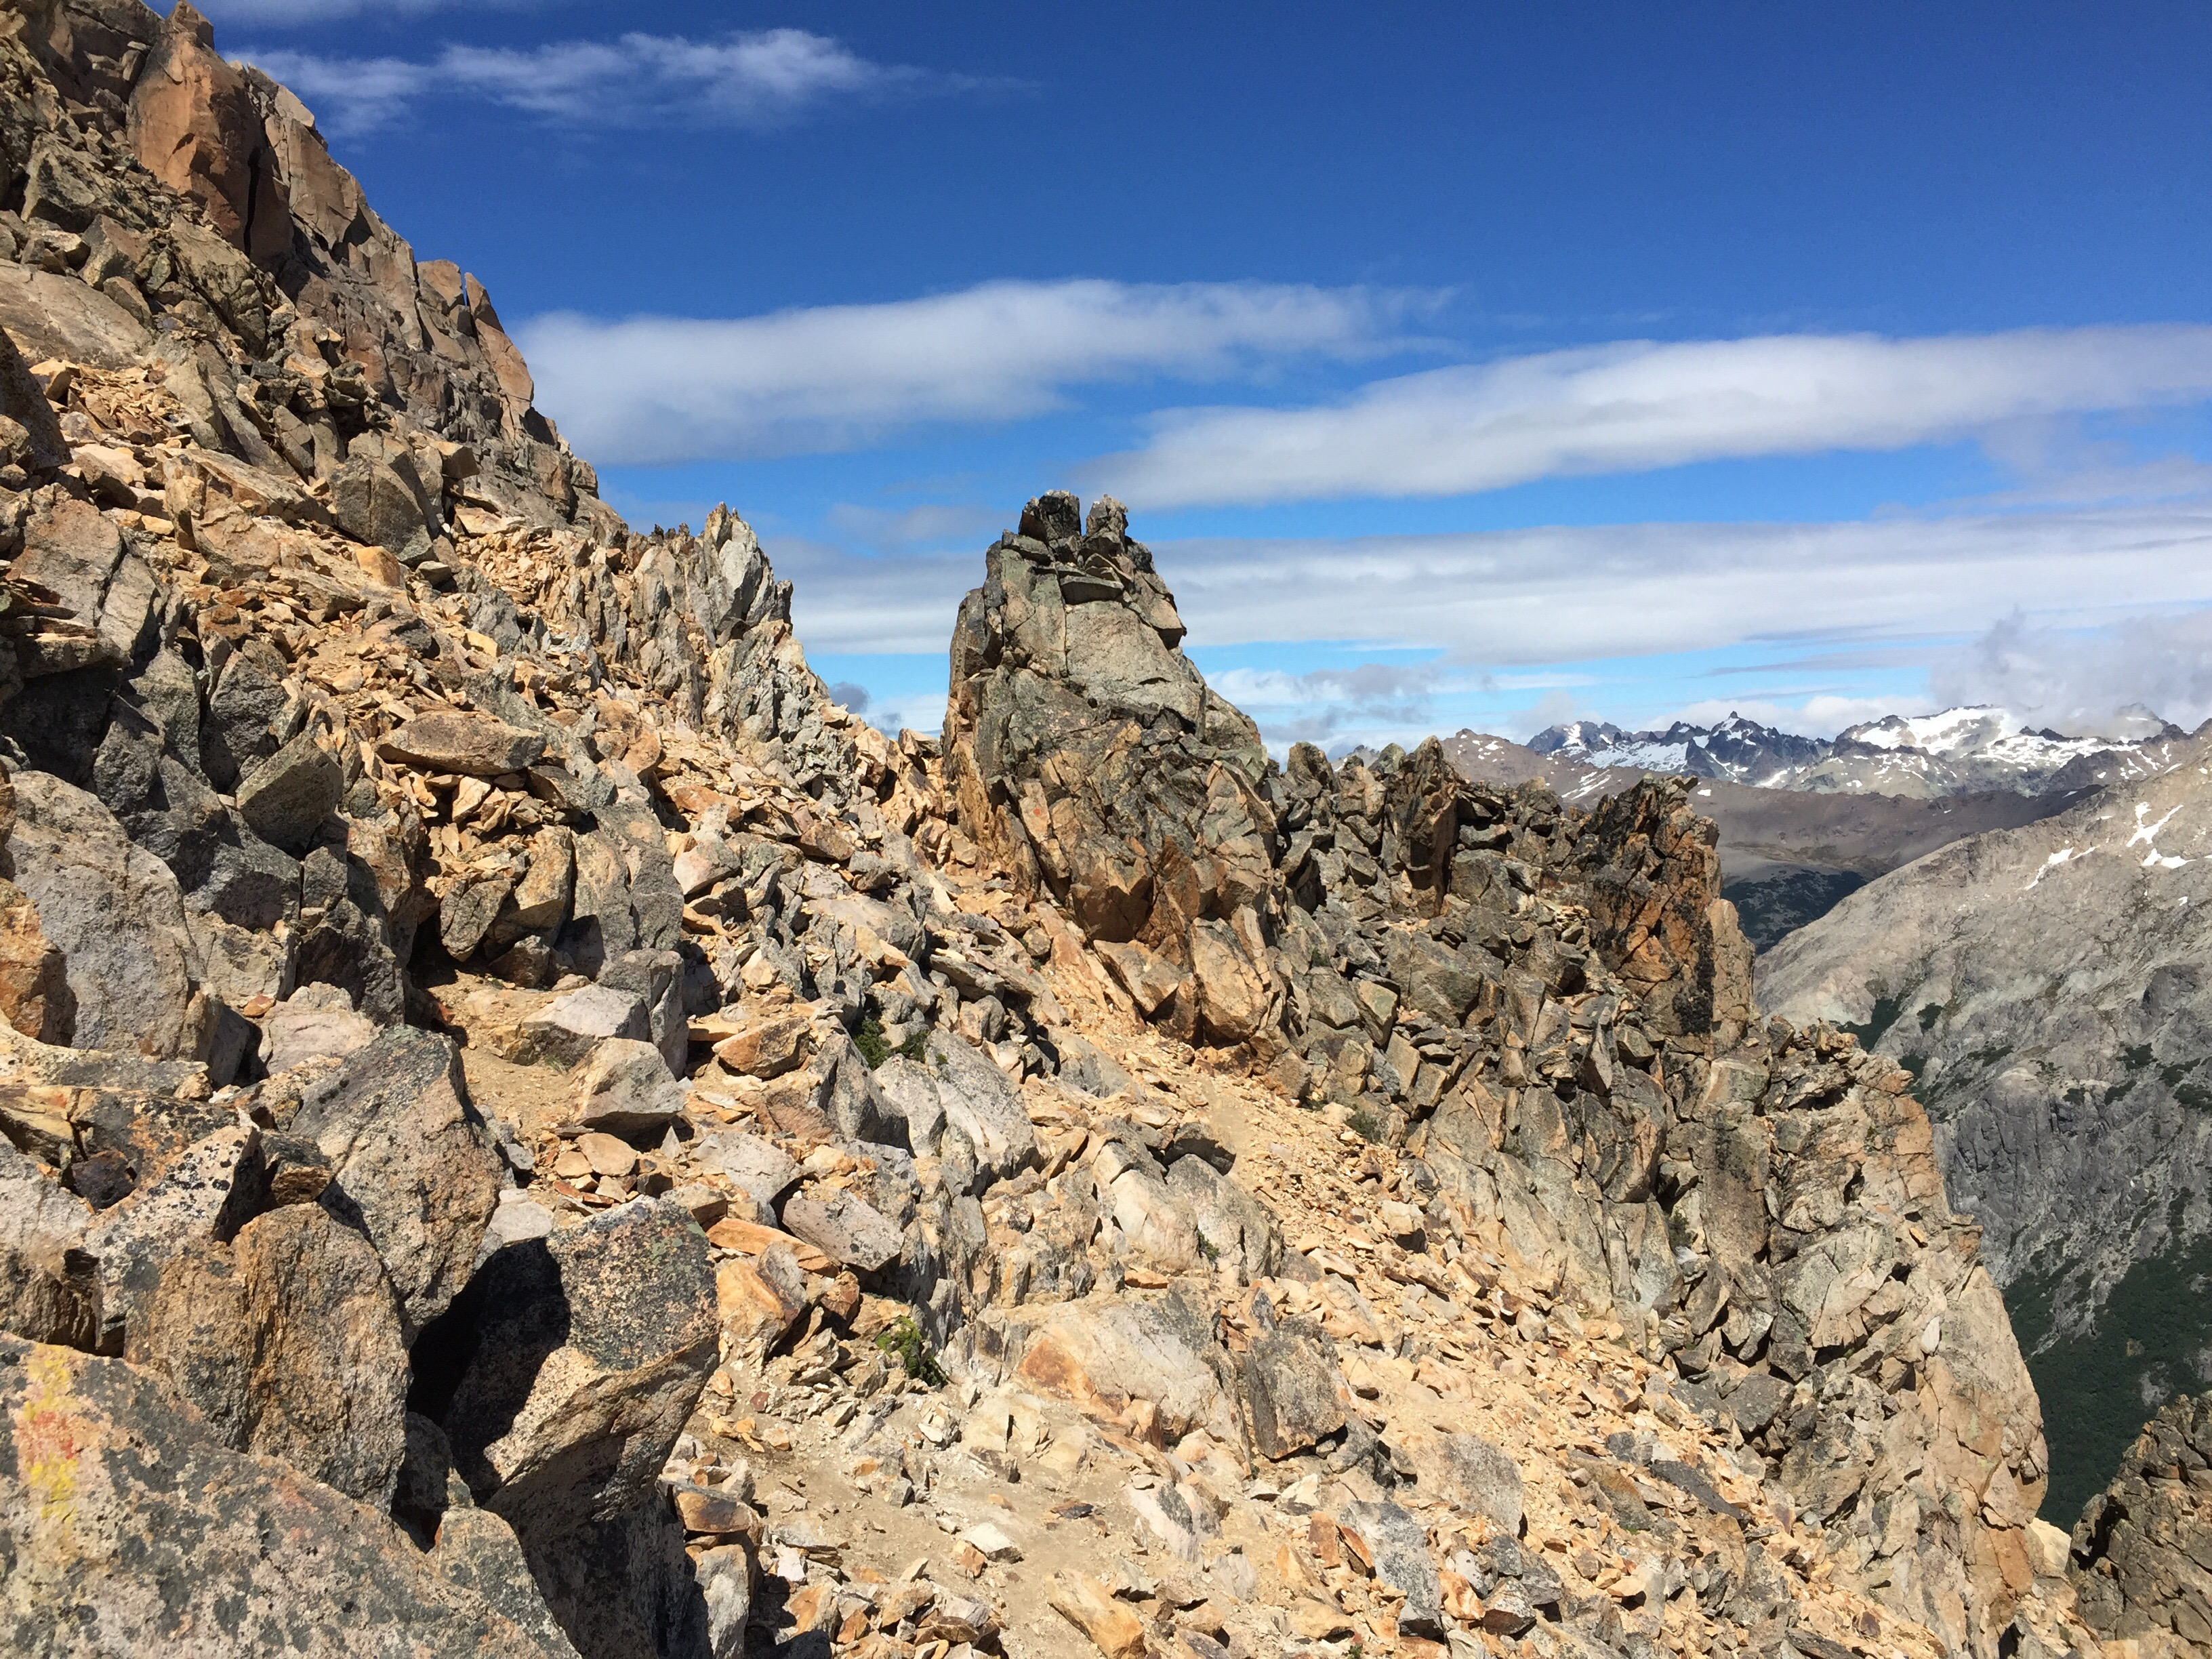 Hochgebirgswandern am Grat des Cerro Catedral